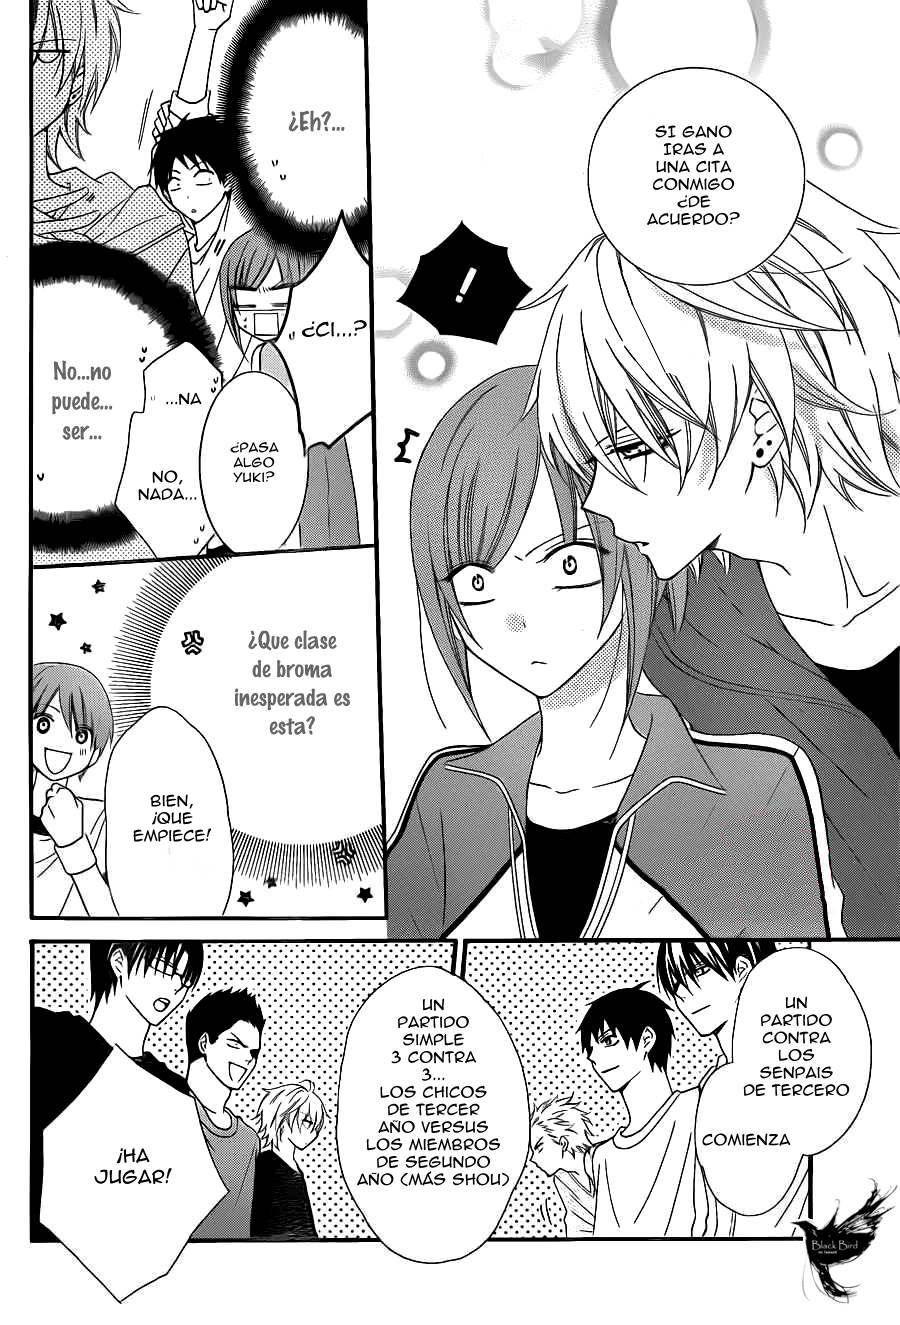 Namaikizakari Vol 1 Ch 2 Página 2 Cargar Imágenes 10 Namaikizakari Manga To Read Anime Stories